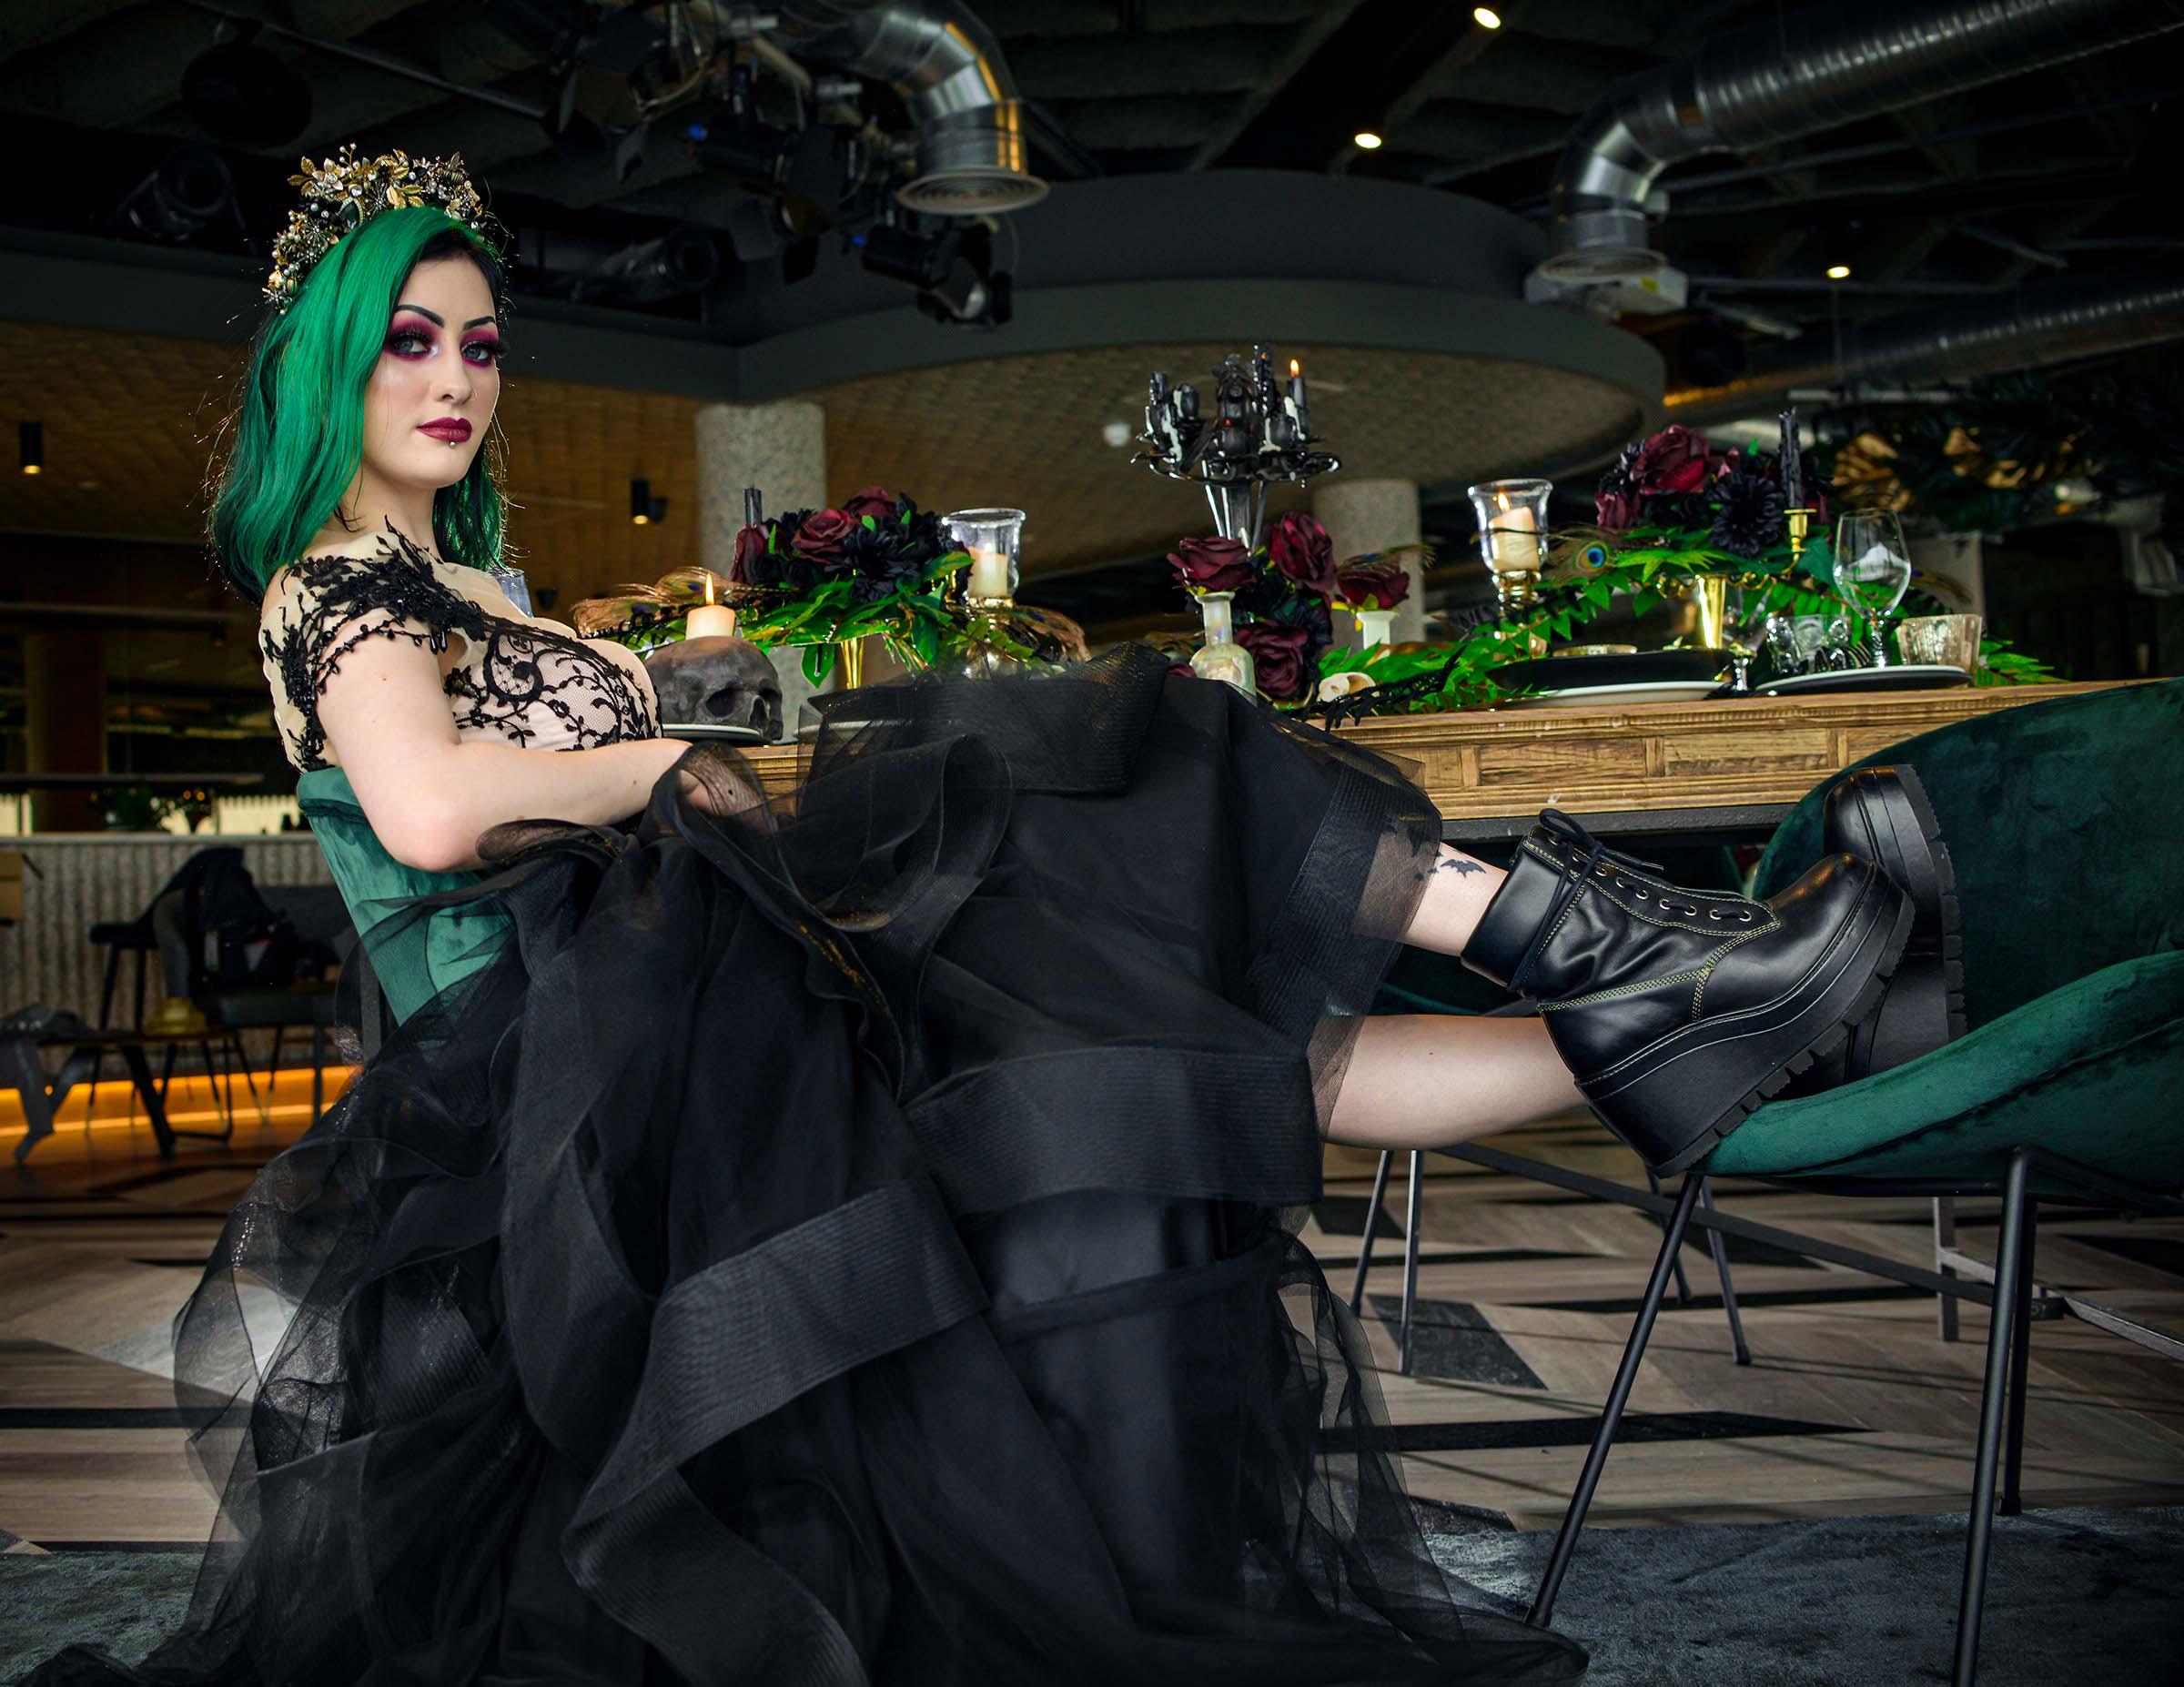 alternative luxe wedding - slytherin wedding - gothic wedding - alternative wedding - black wedding dress - black bridal wear - gothic bride